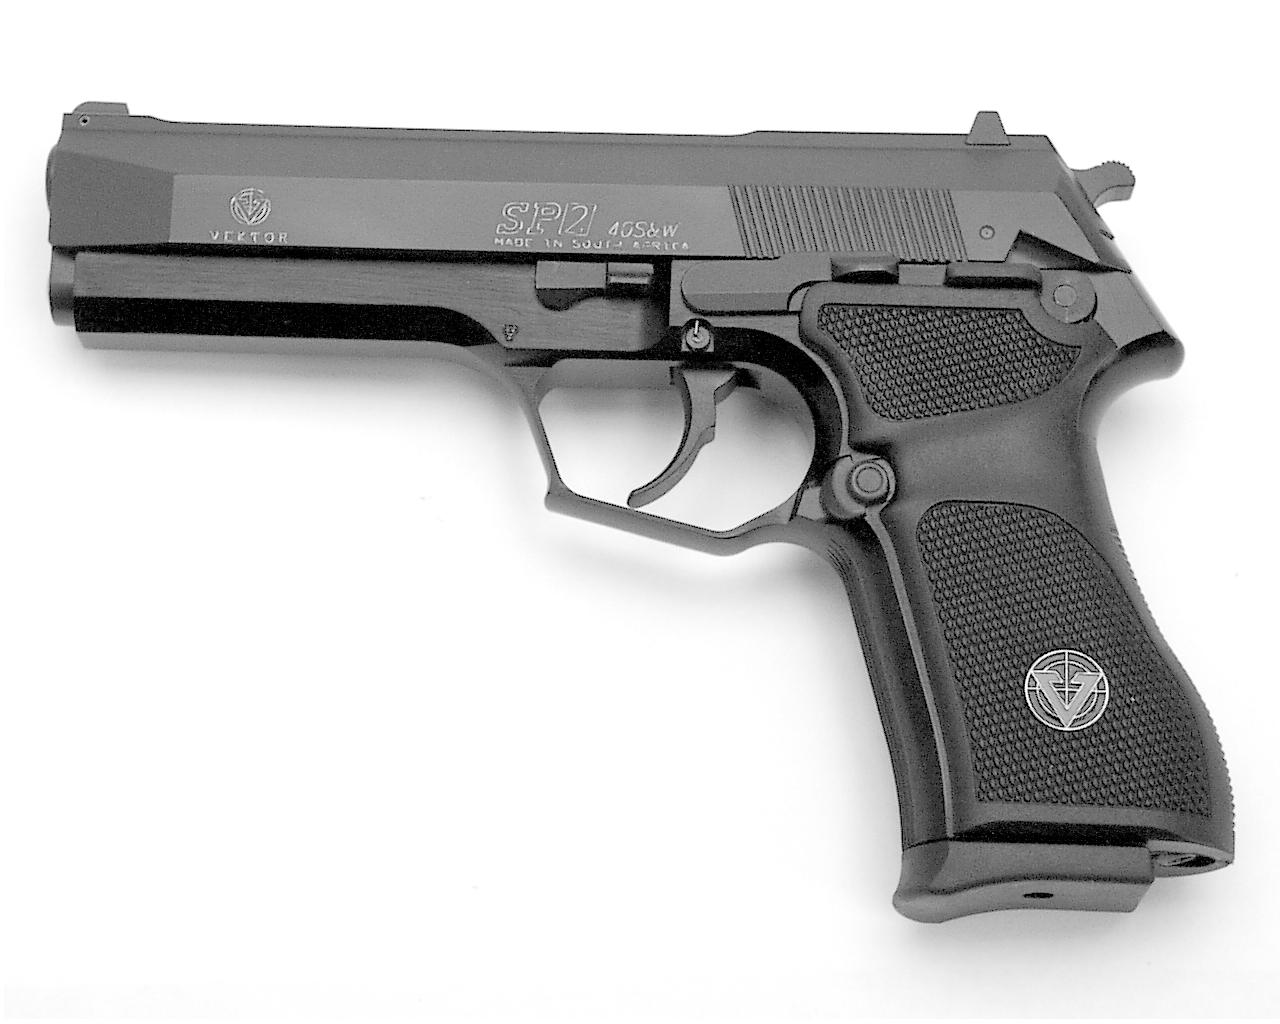 Model SP2